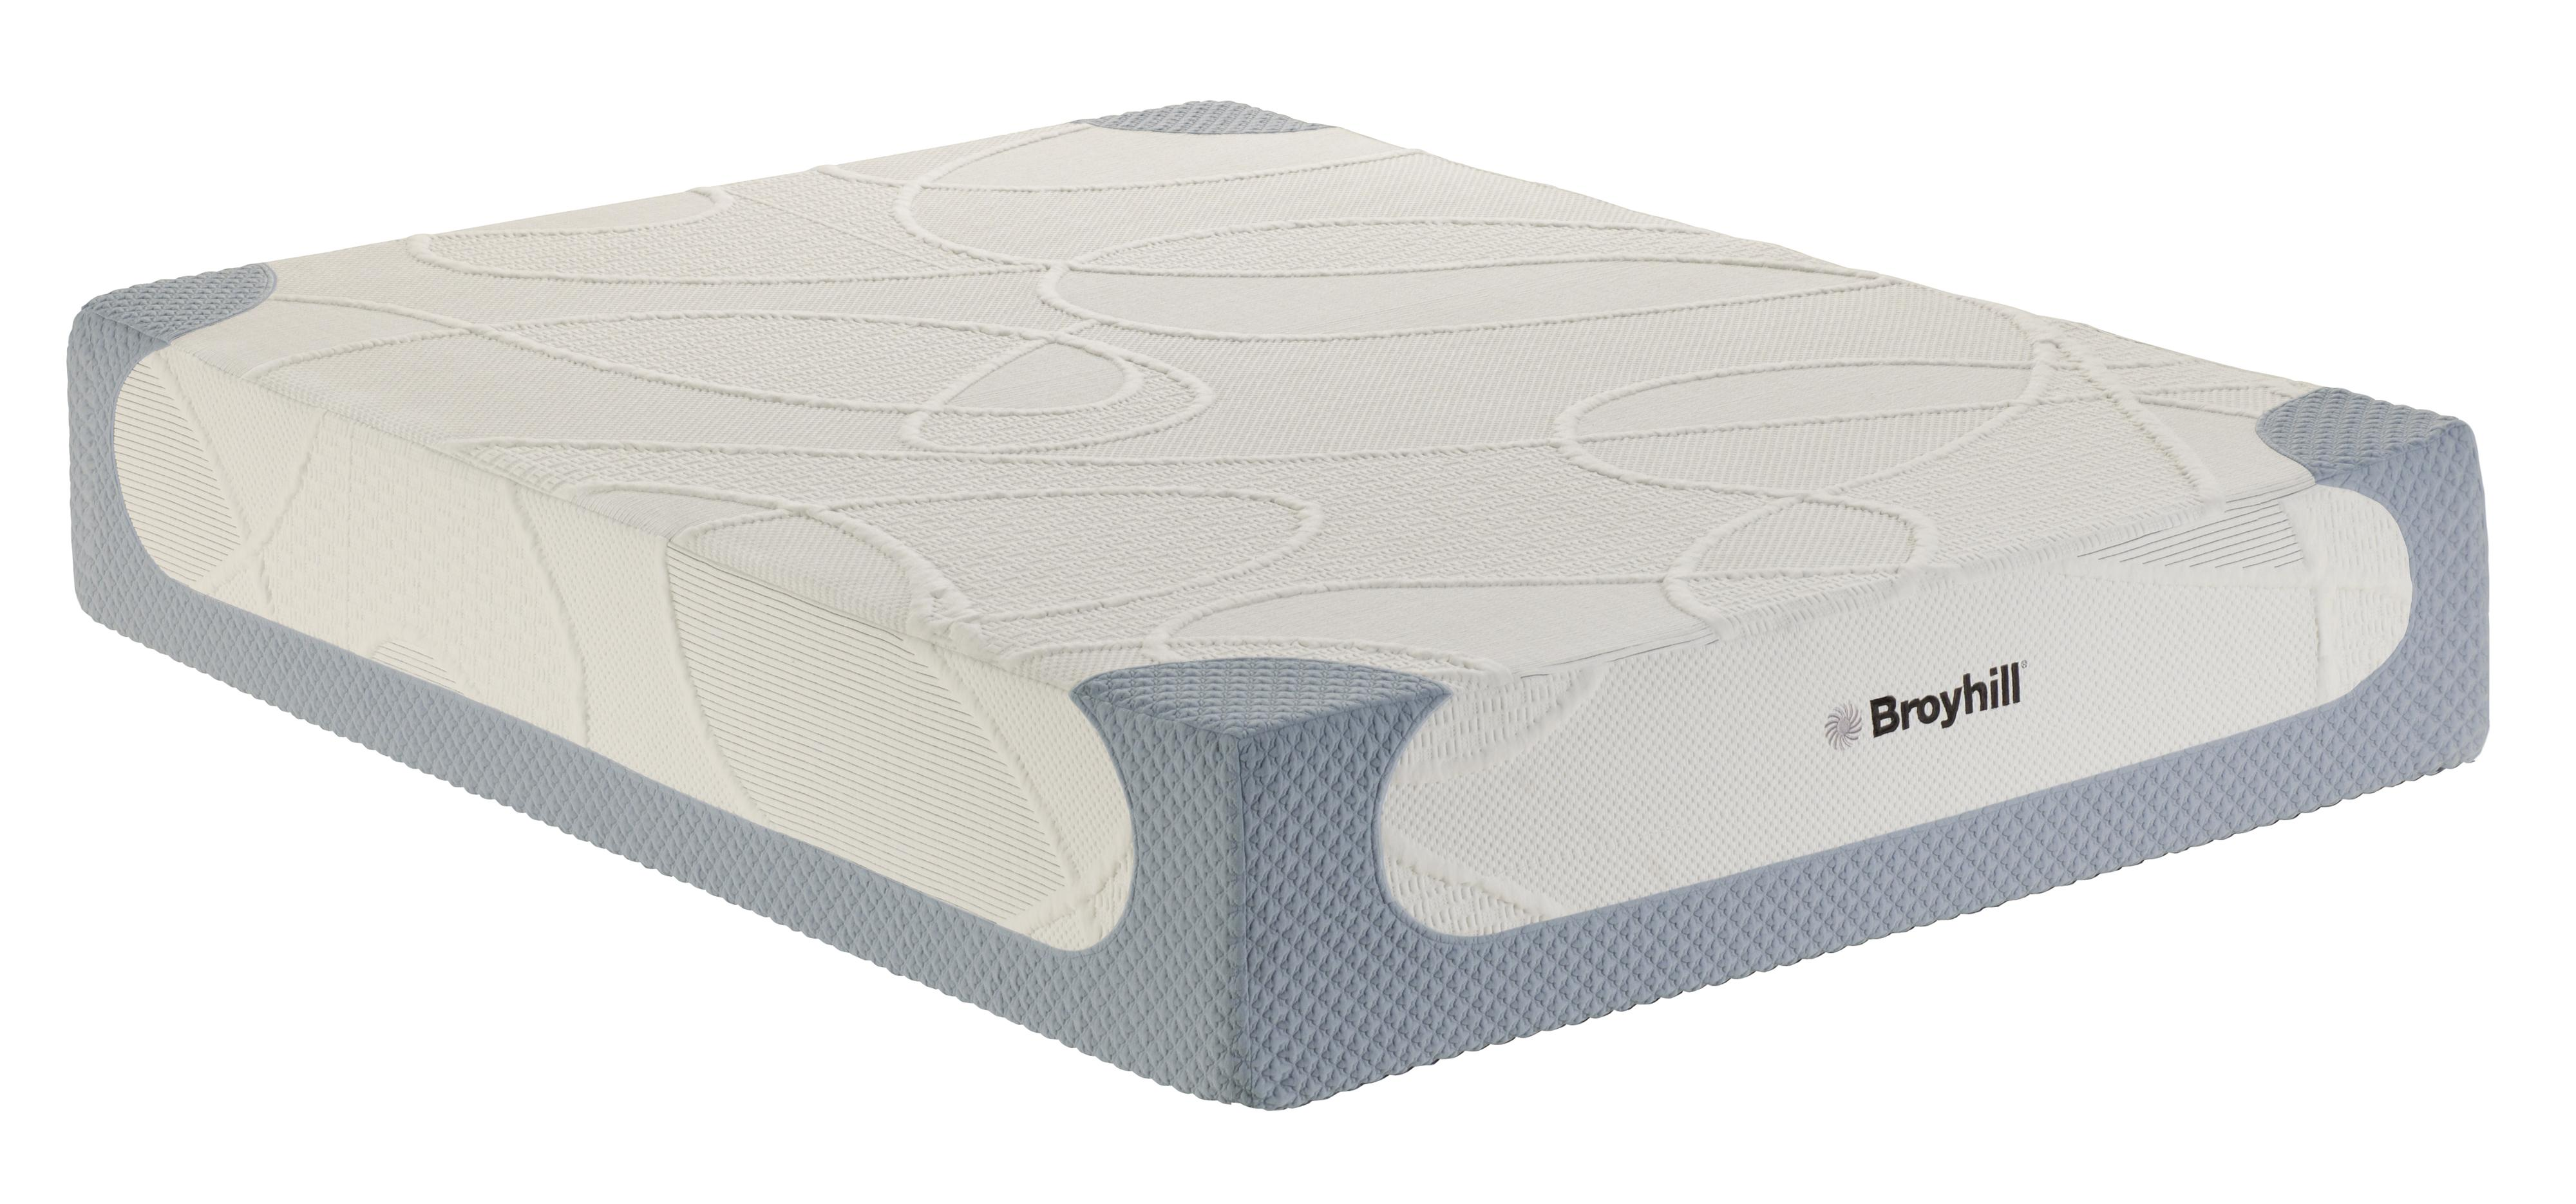 Sensura Cal King Plush Memory Foam Mattress Set by Boyd Specialty Sleep at Beds N Stuff